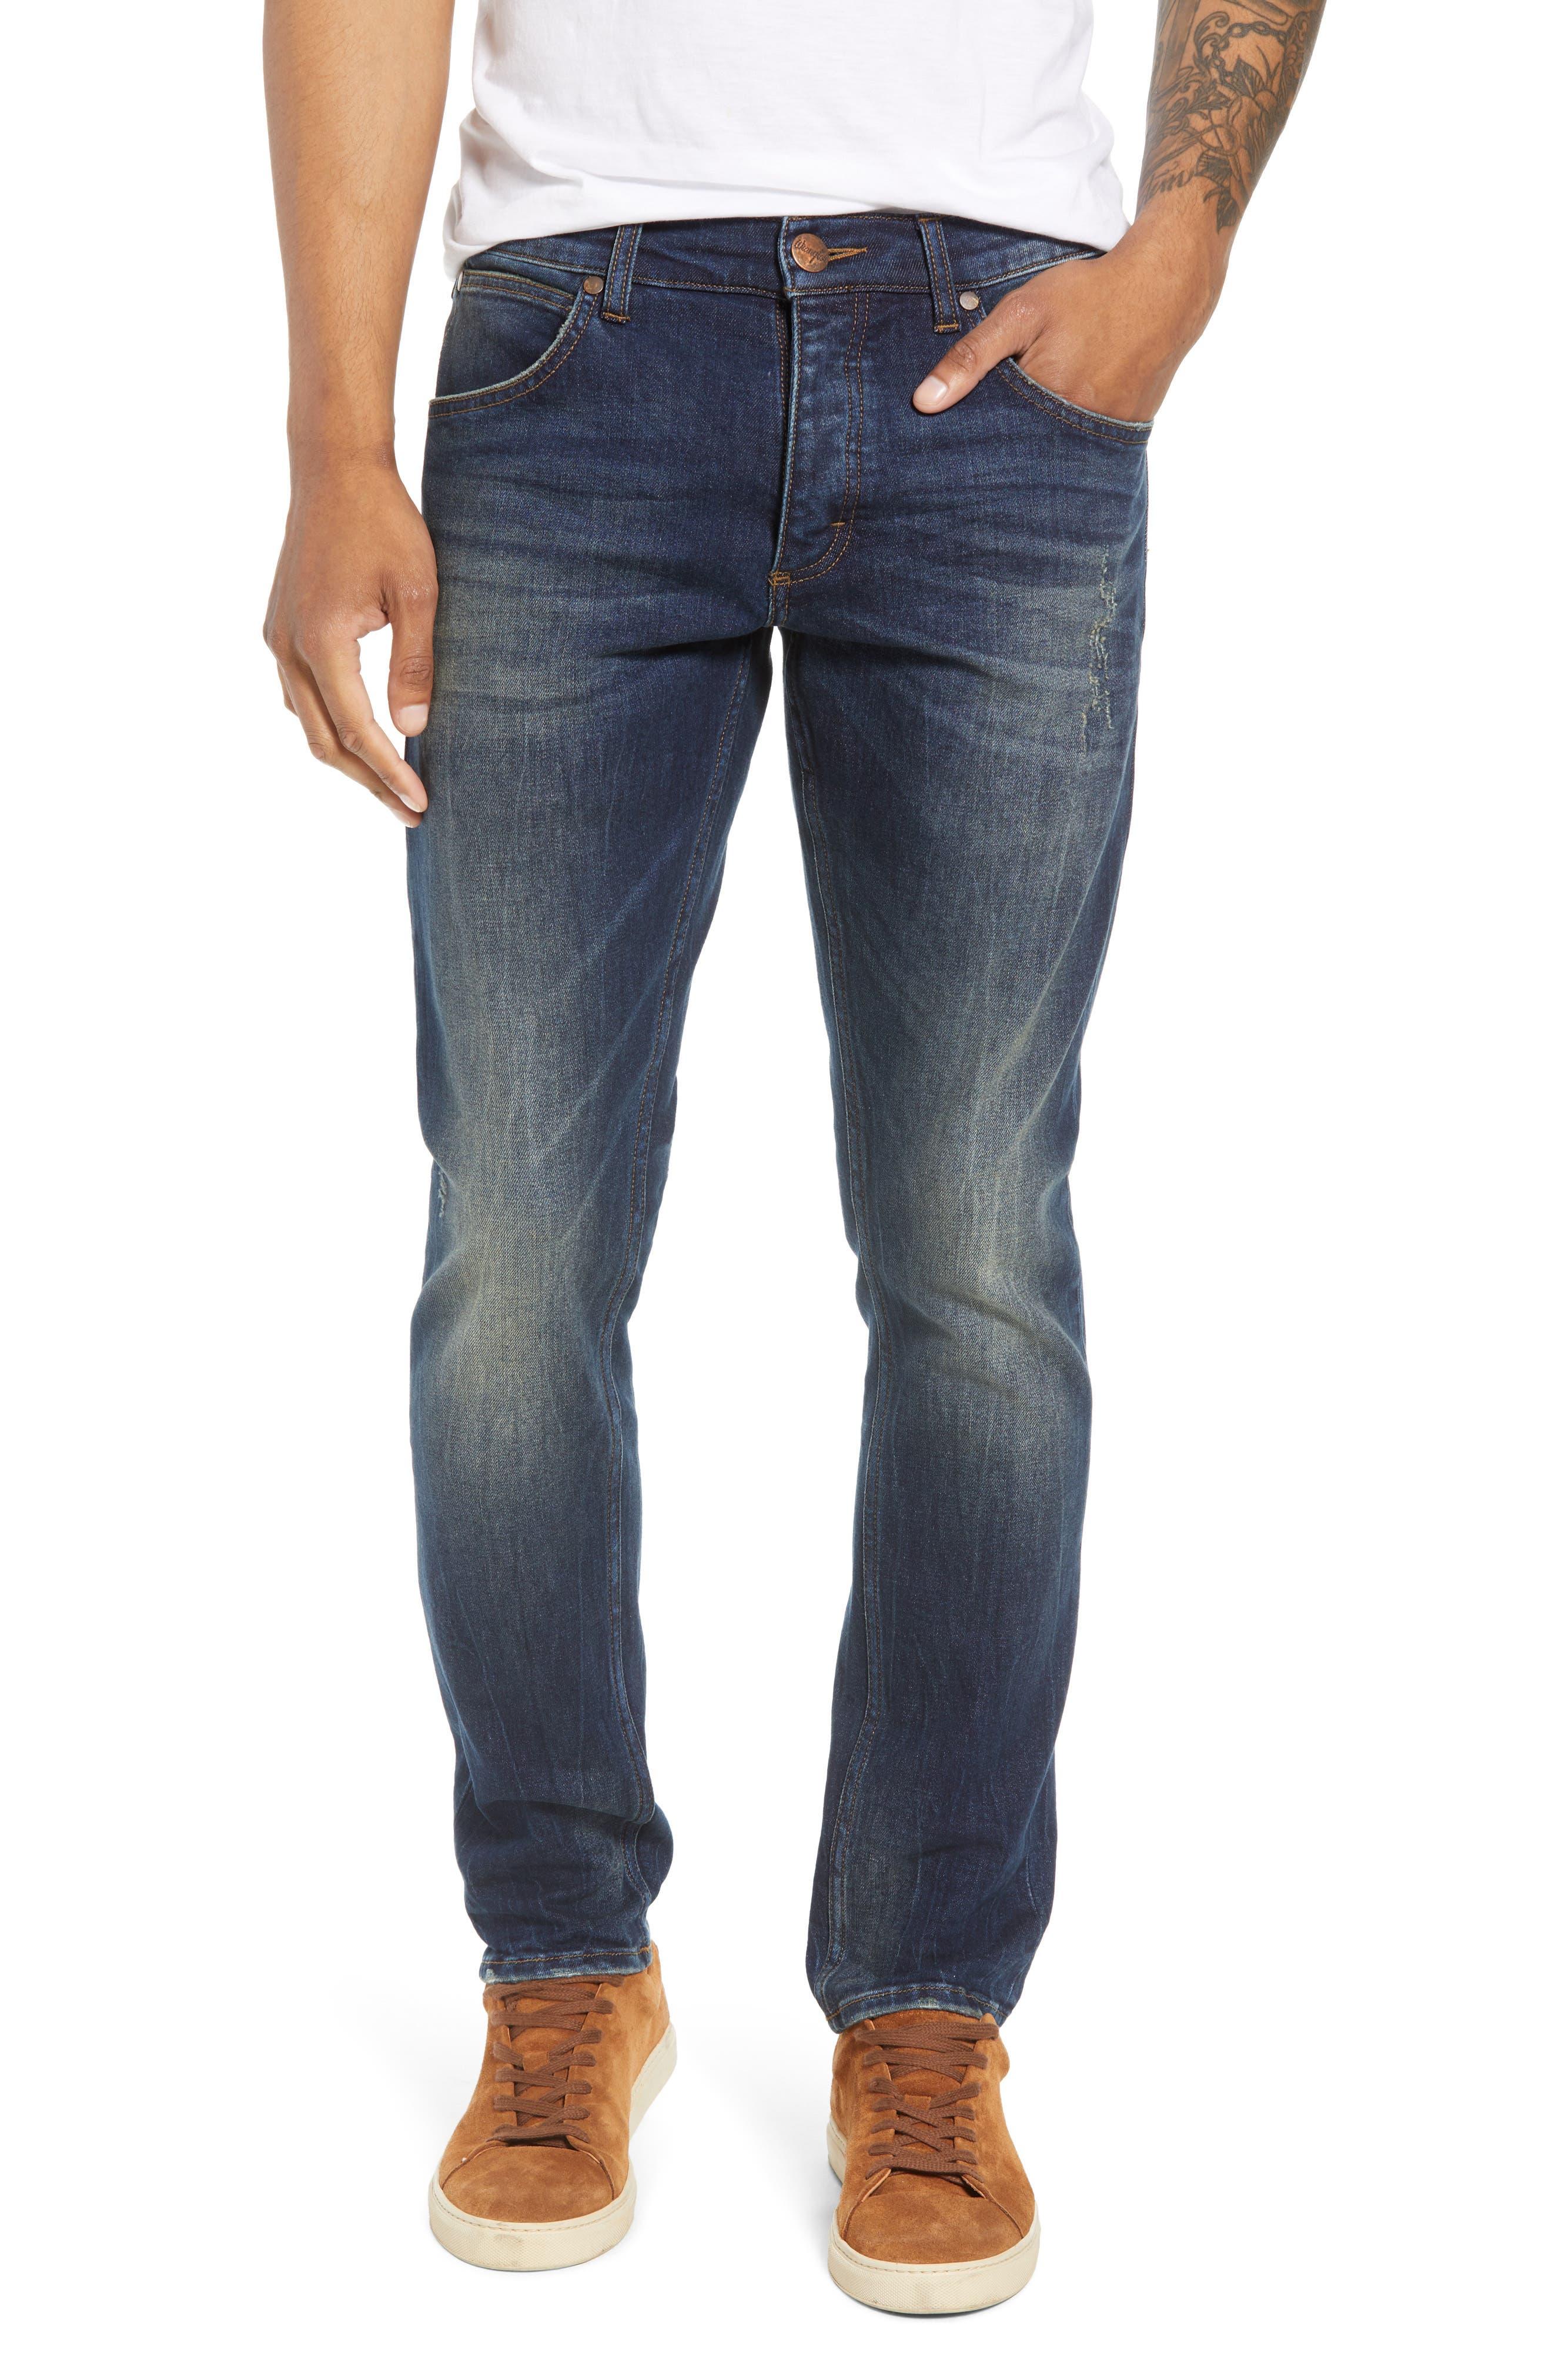 Larston Slim Fit Jeans,                             Main thumbnail 1, color,                             VINTAGE DARK